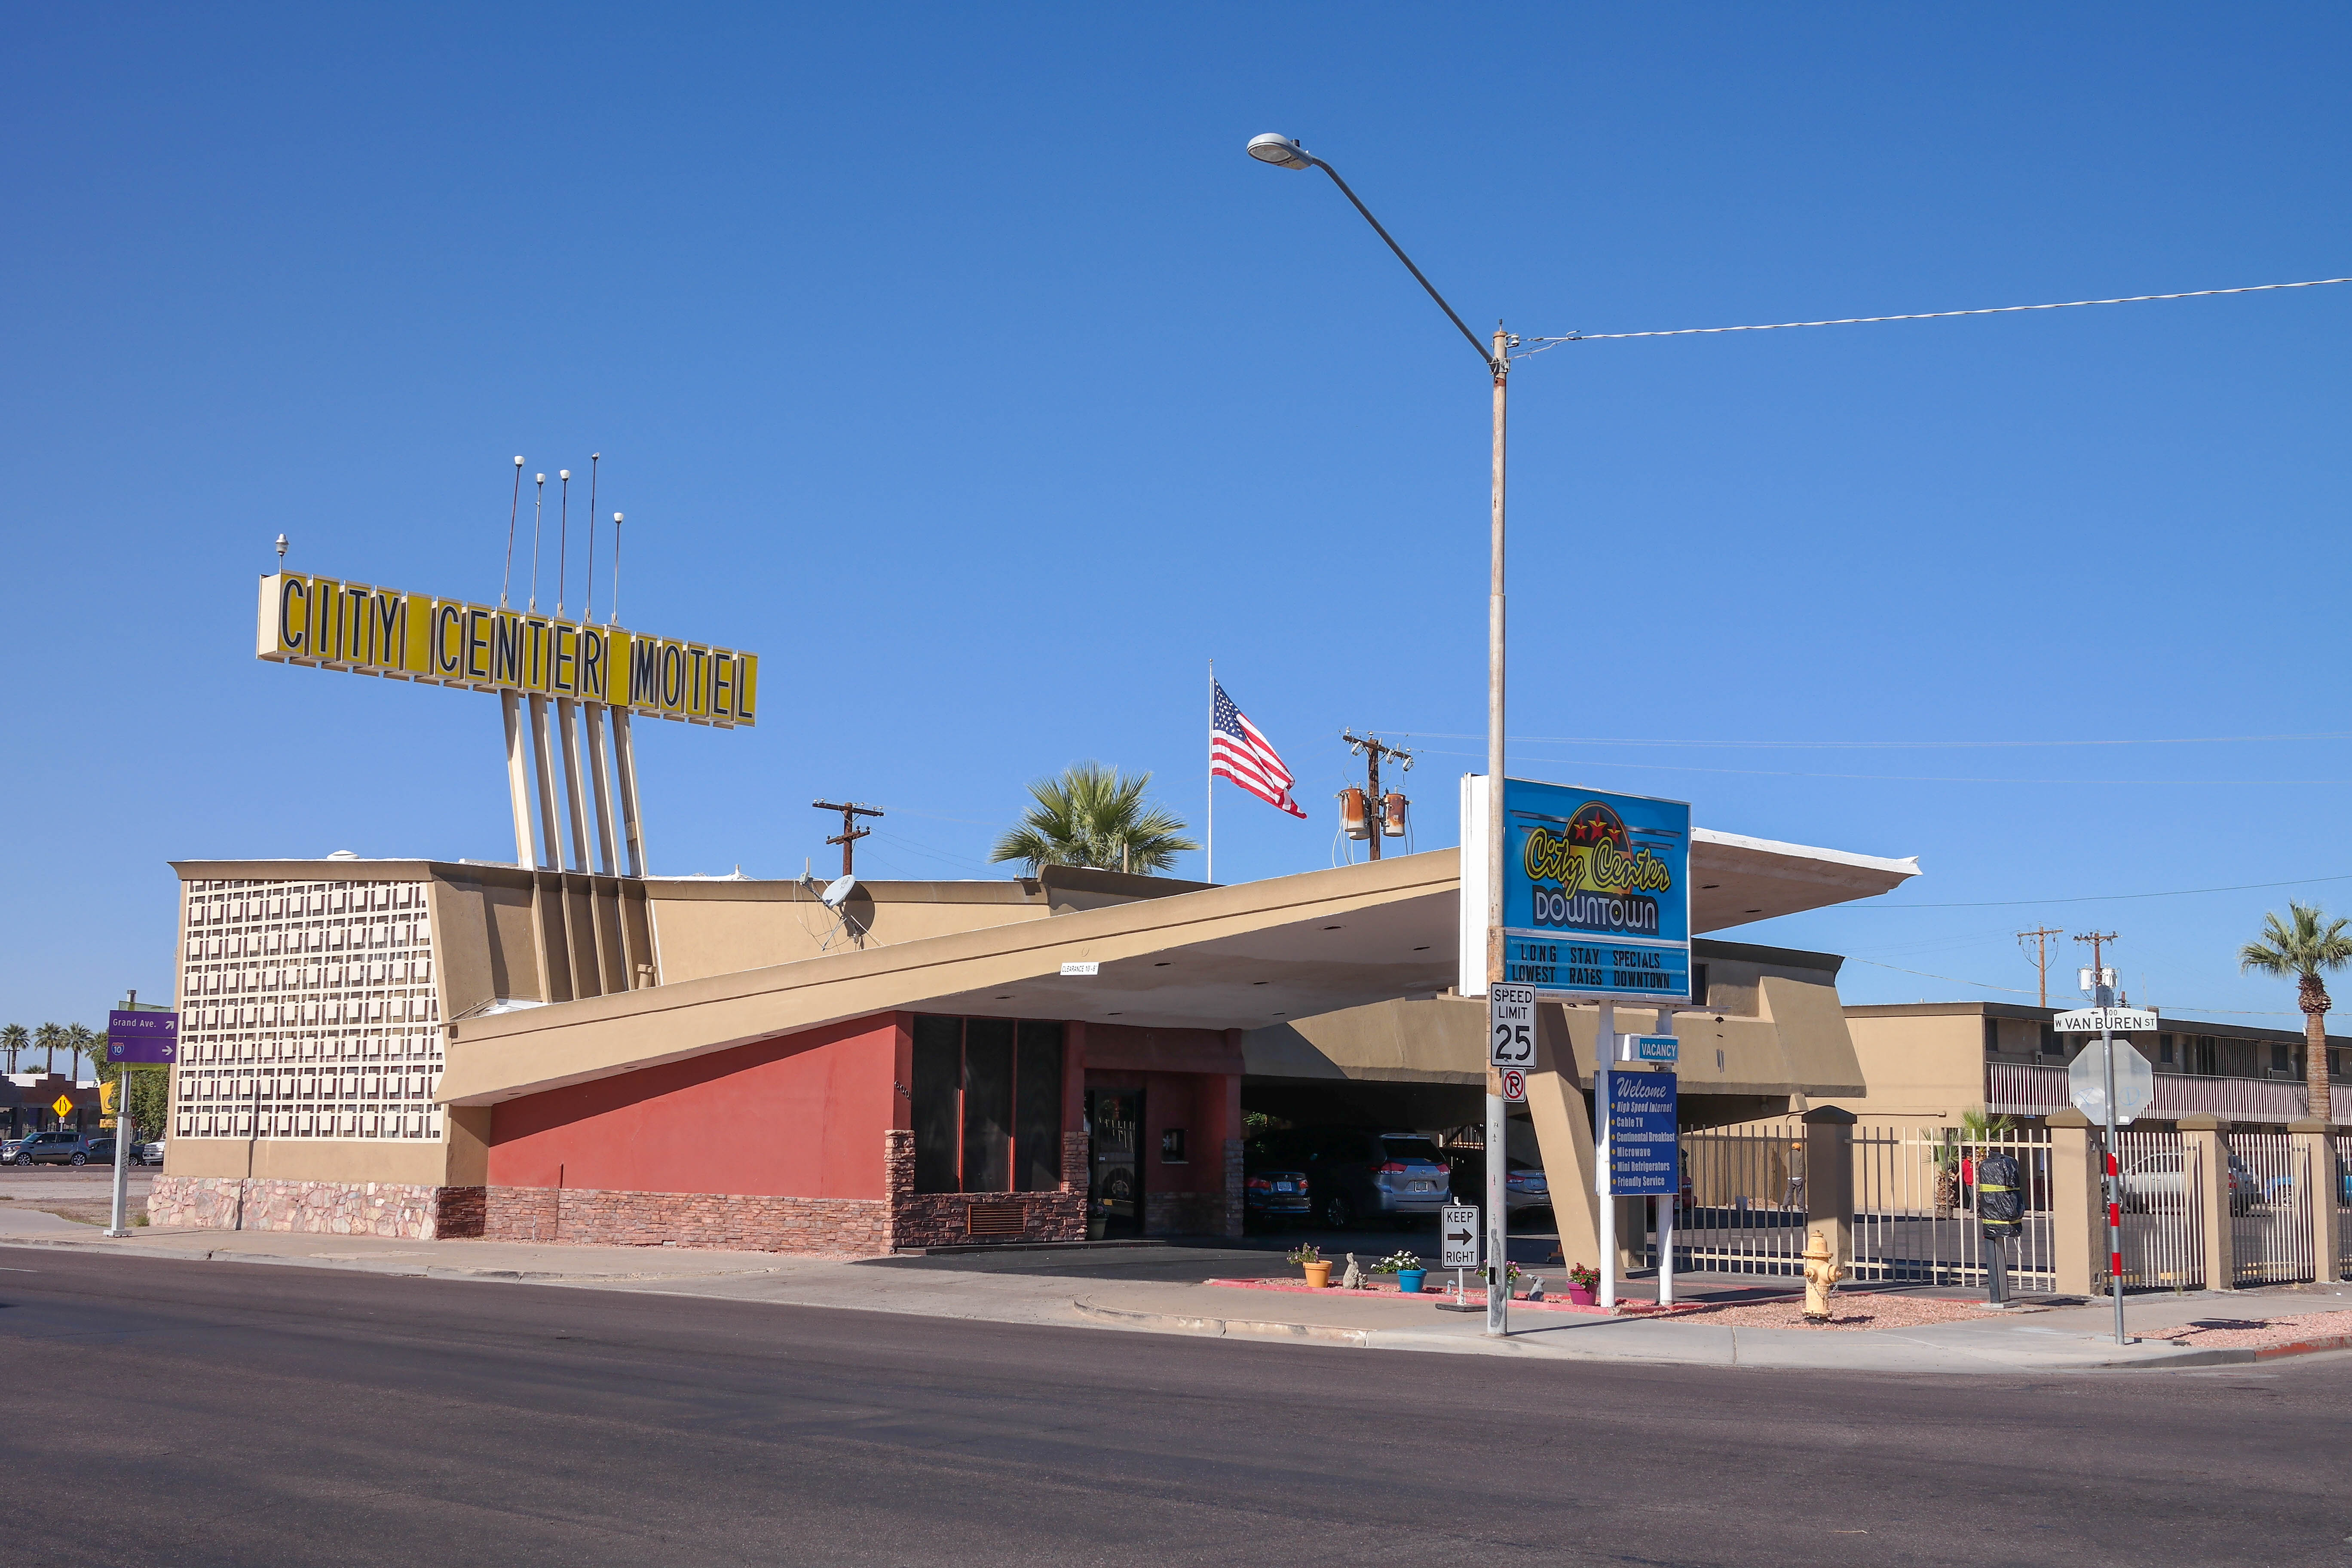 City Center Motel Las Vegas Reviews